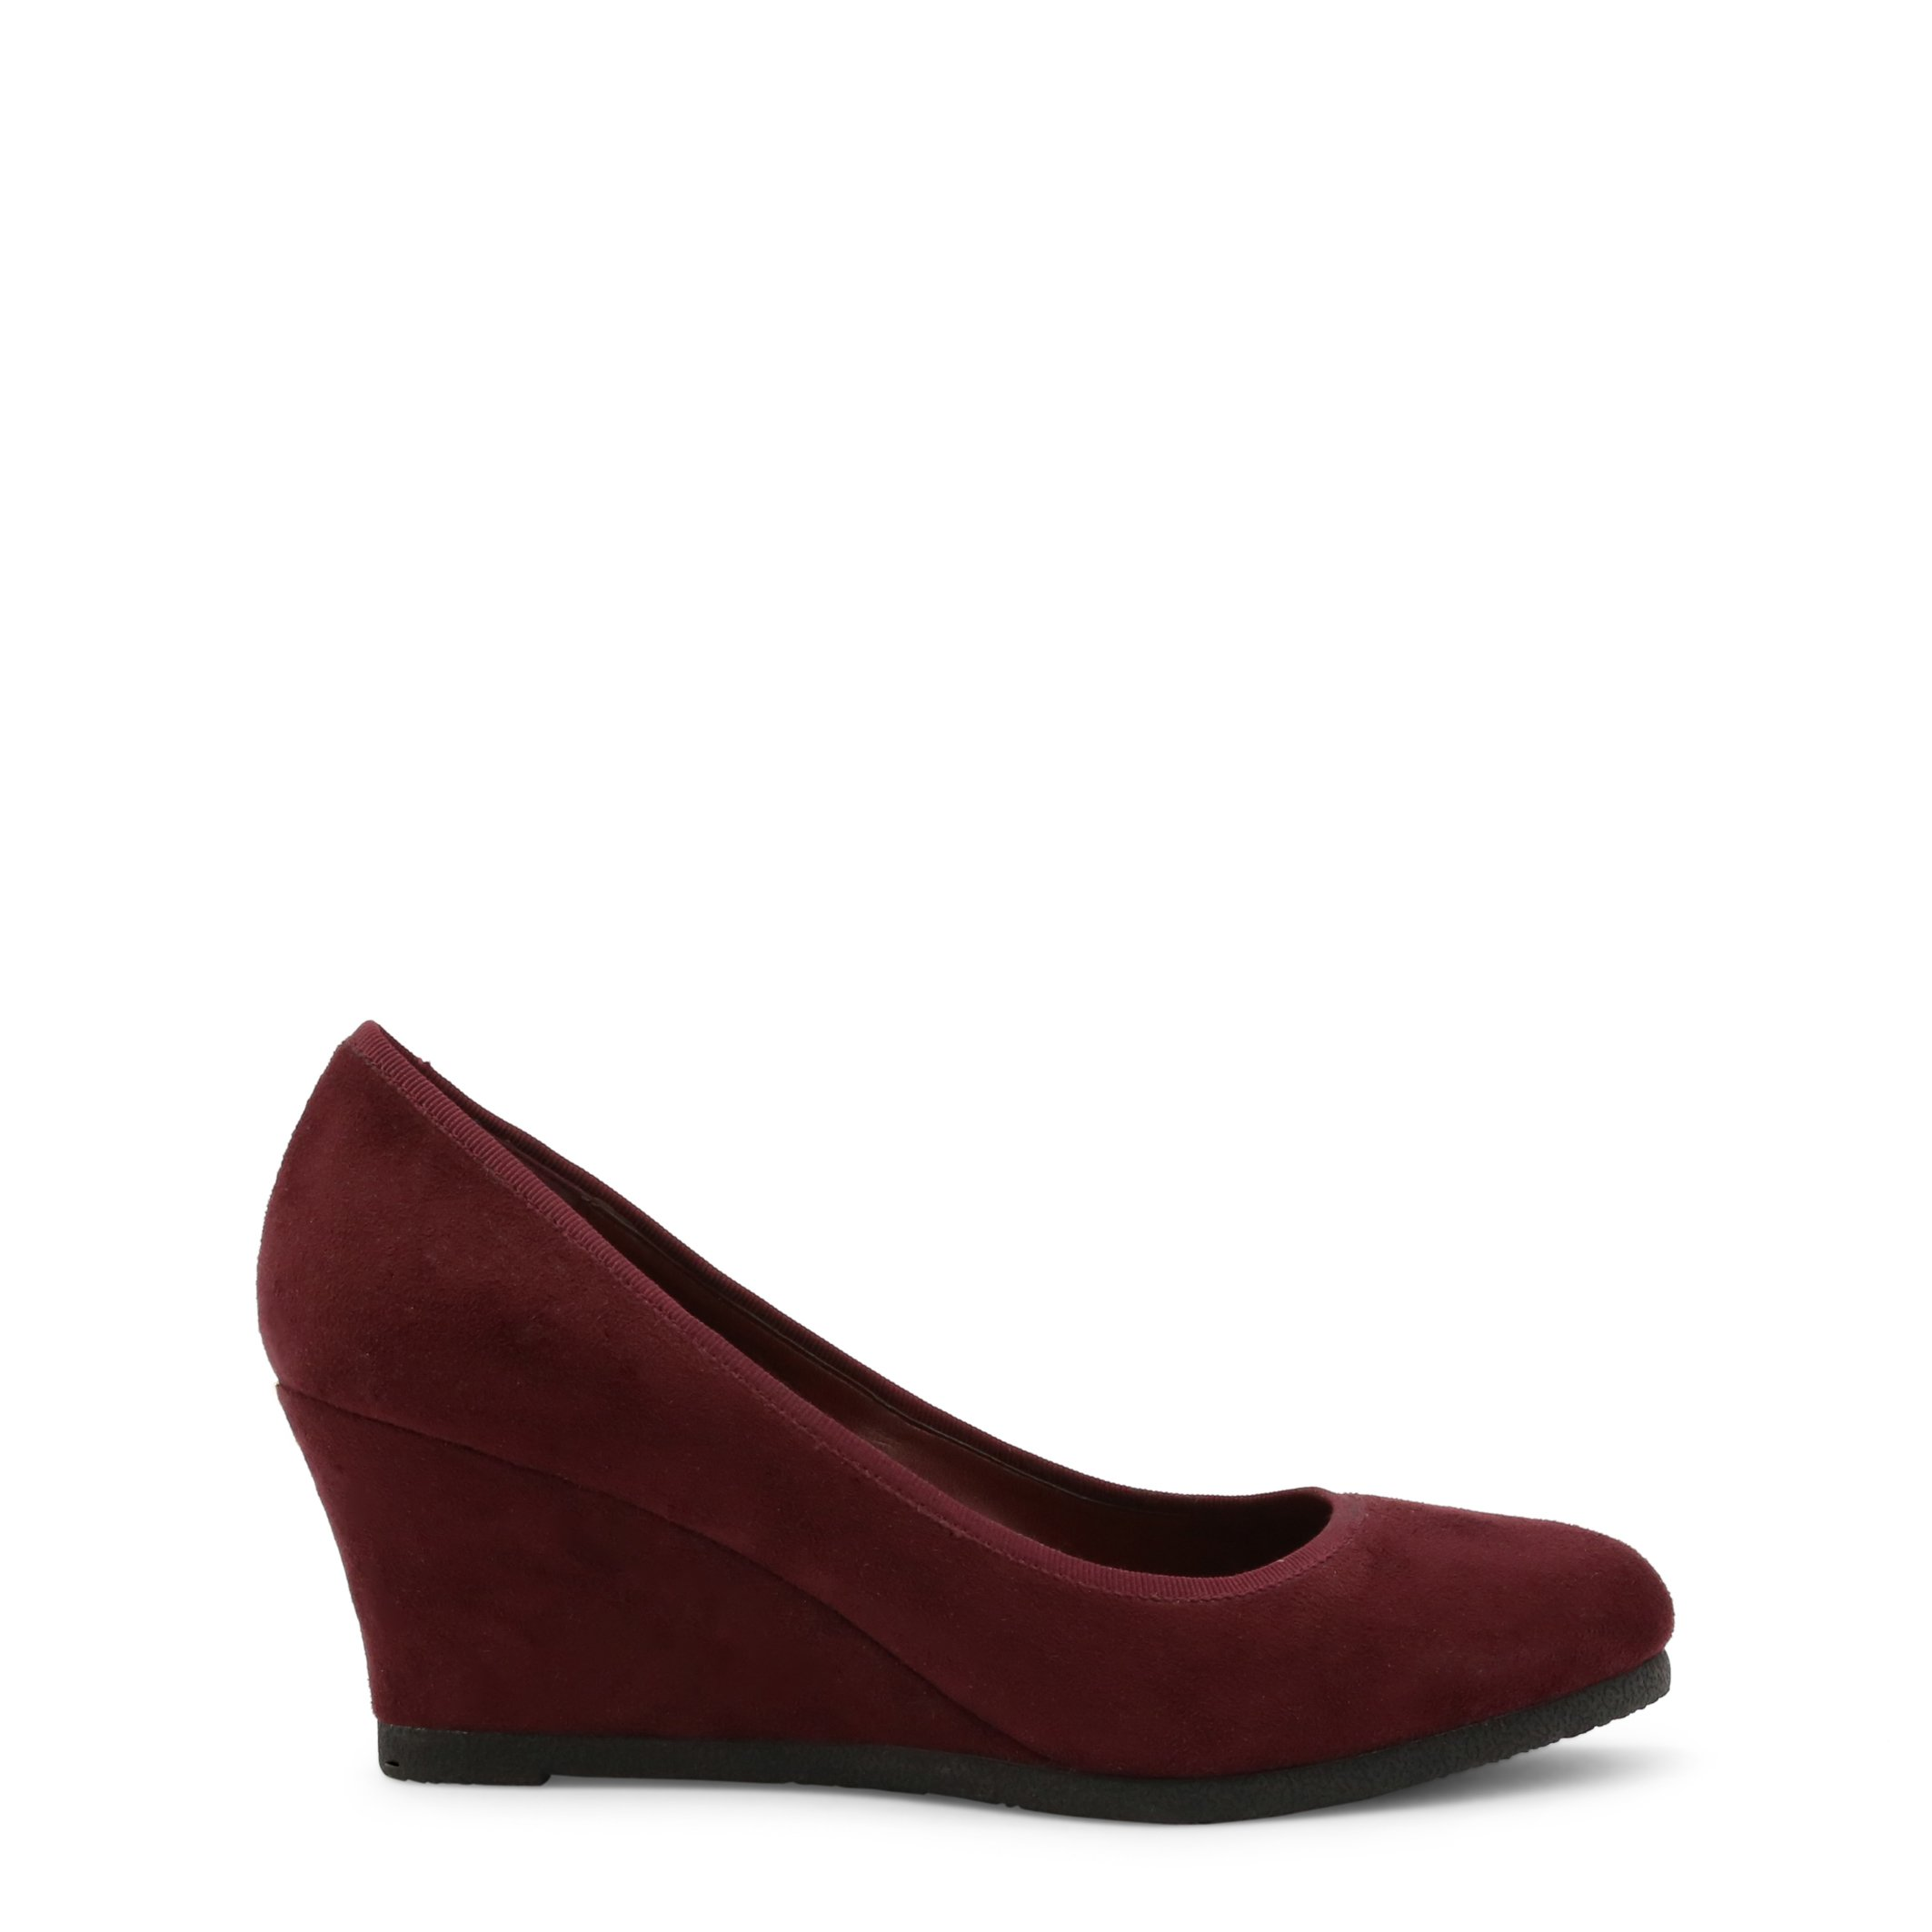 Roccobarocco Women's Wedges Shoe Brown 342946 - red EU 37